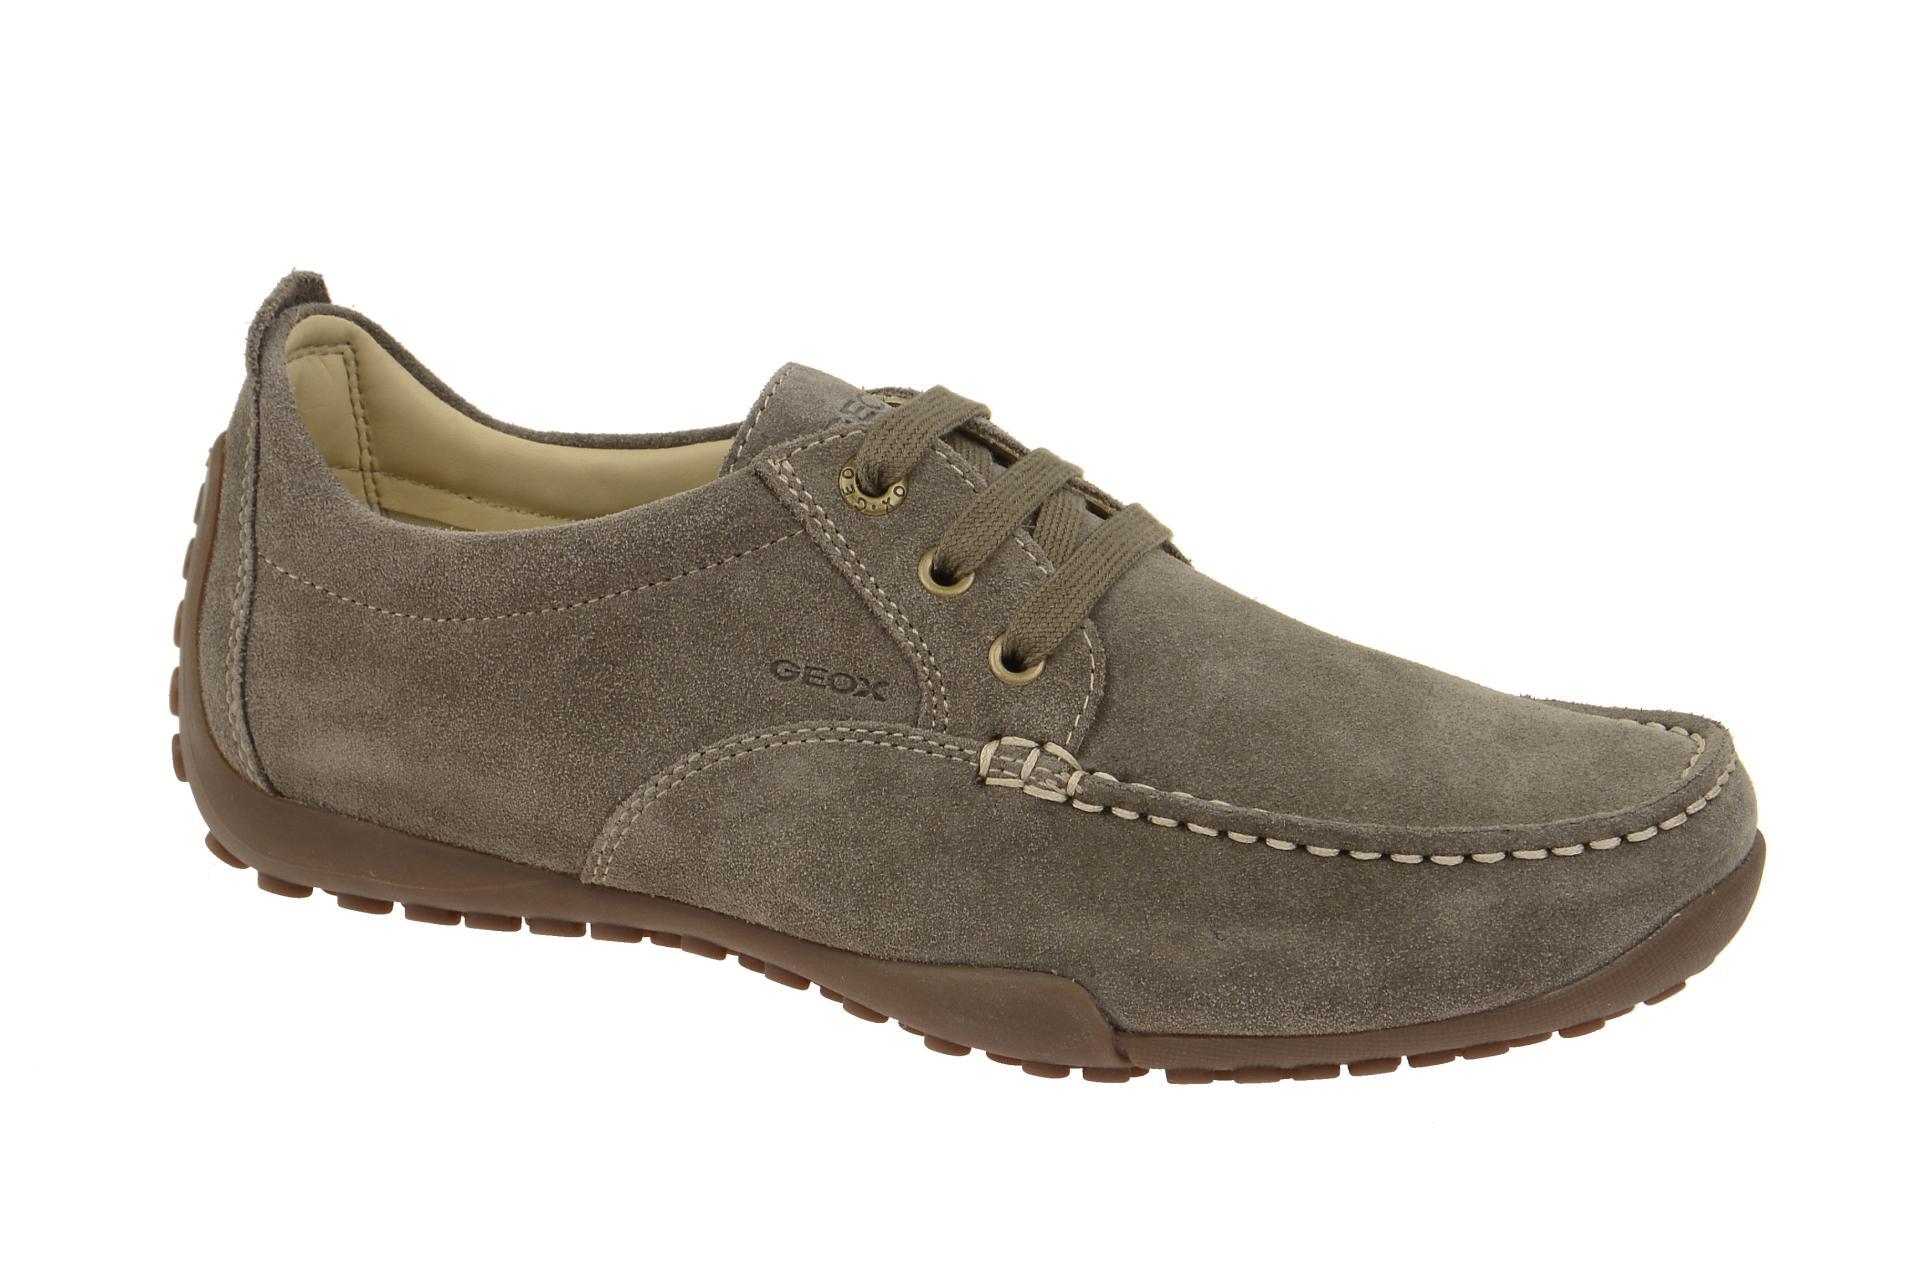 19a56c7d2ce7cd Geox Schuhe DRIVE SNAKE grau Herrenschuhe U2202N 00022 C6029 NEU